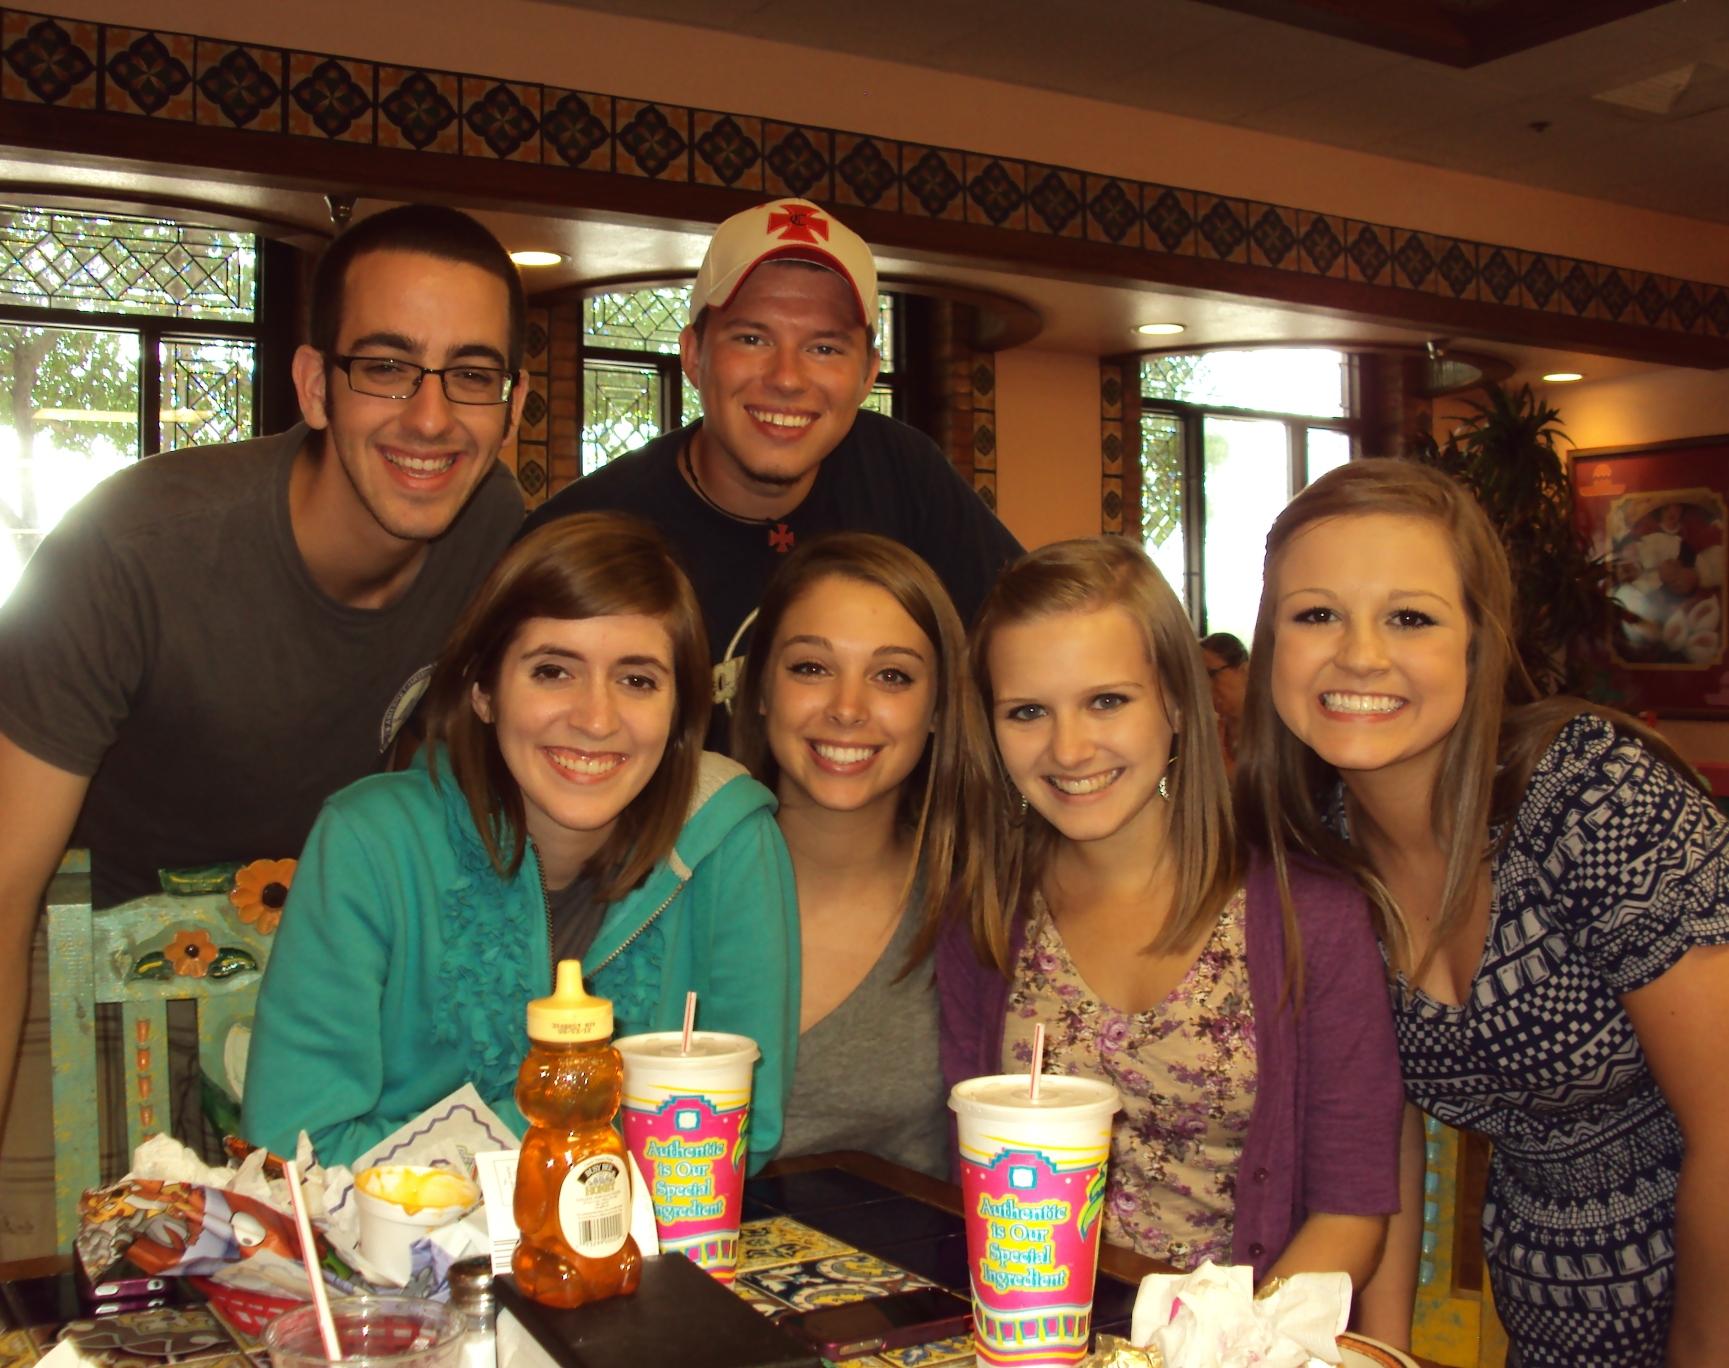 Legacy kids at ACU; good looking group!